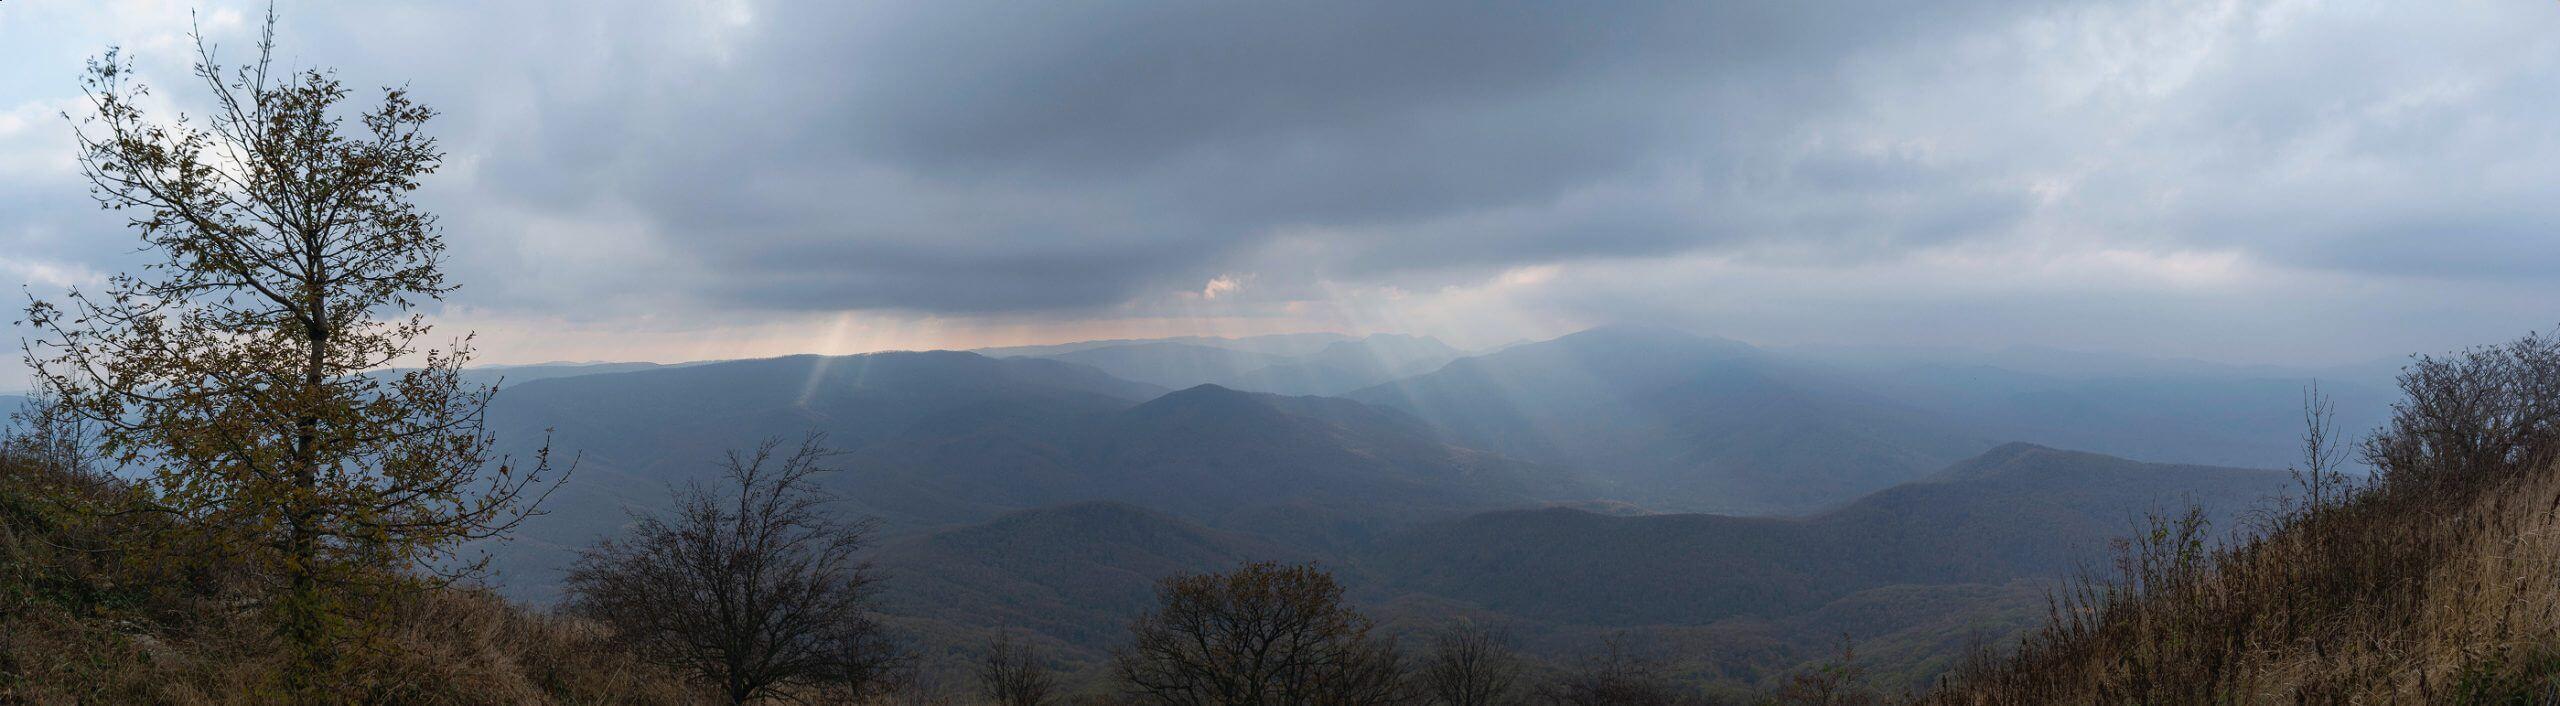 Вид с вершины Собер-Баша